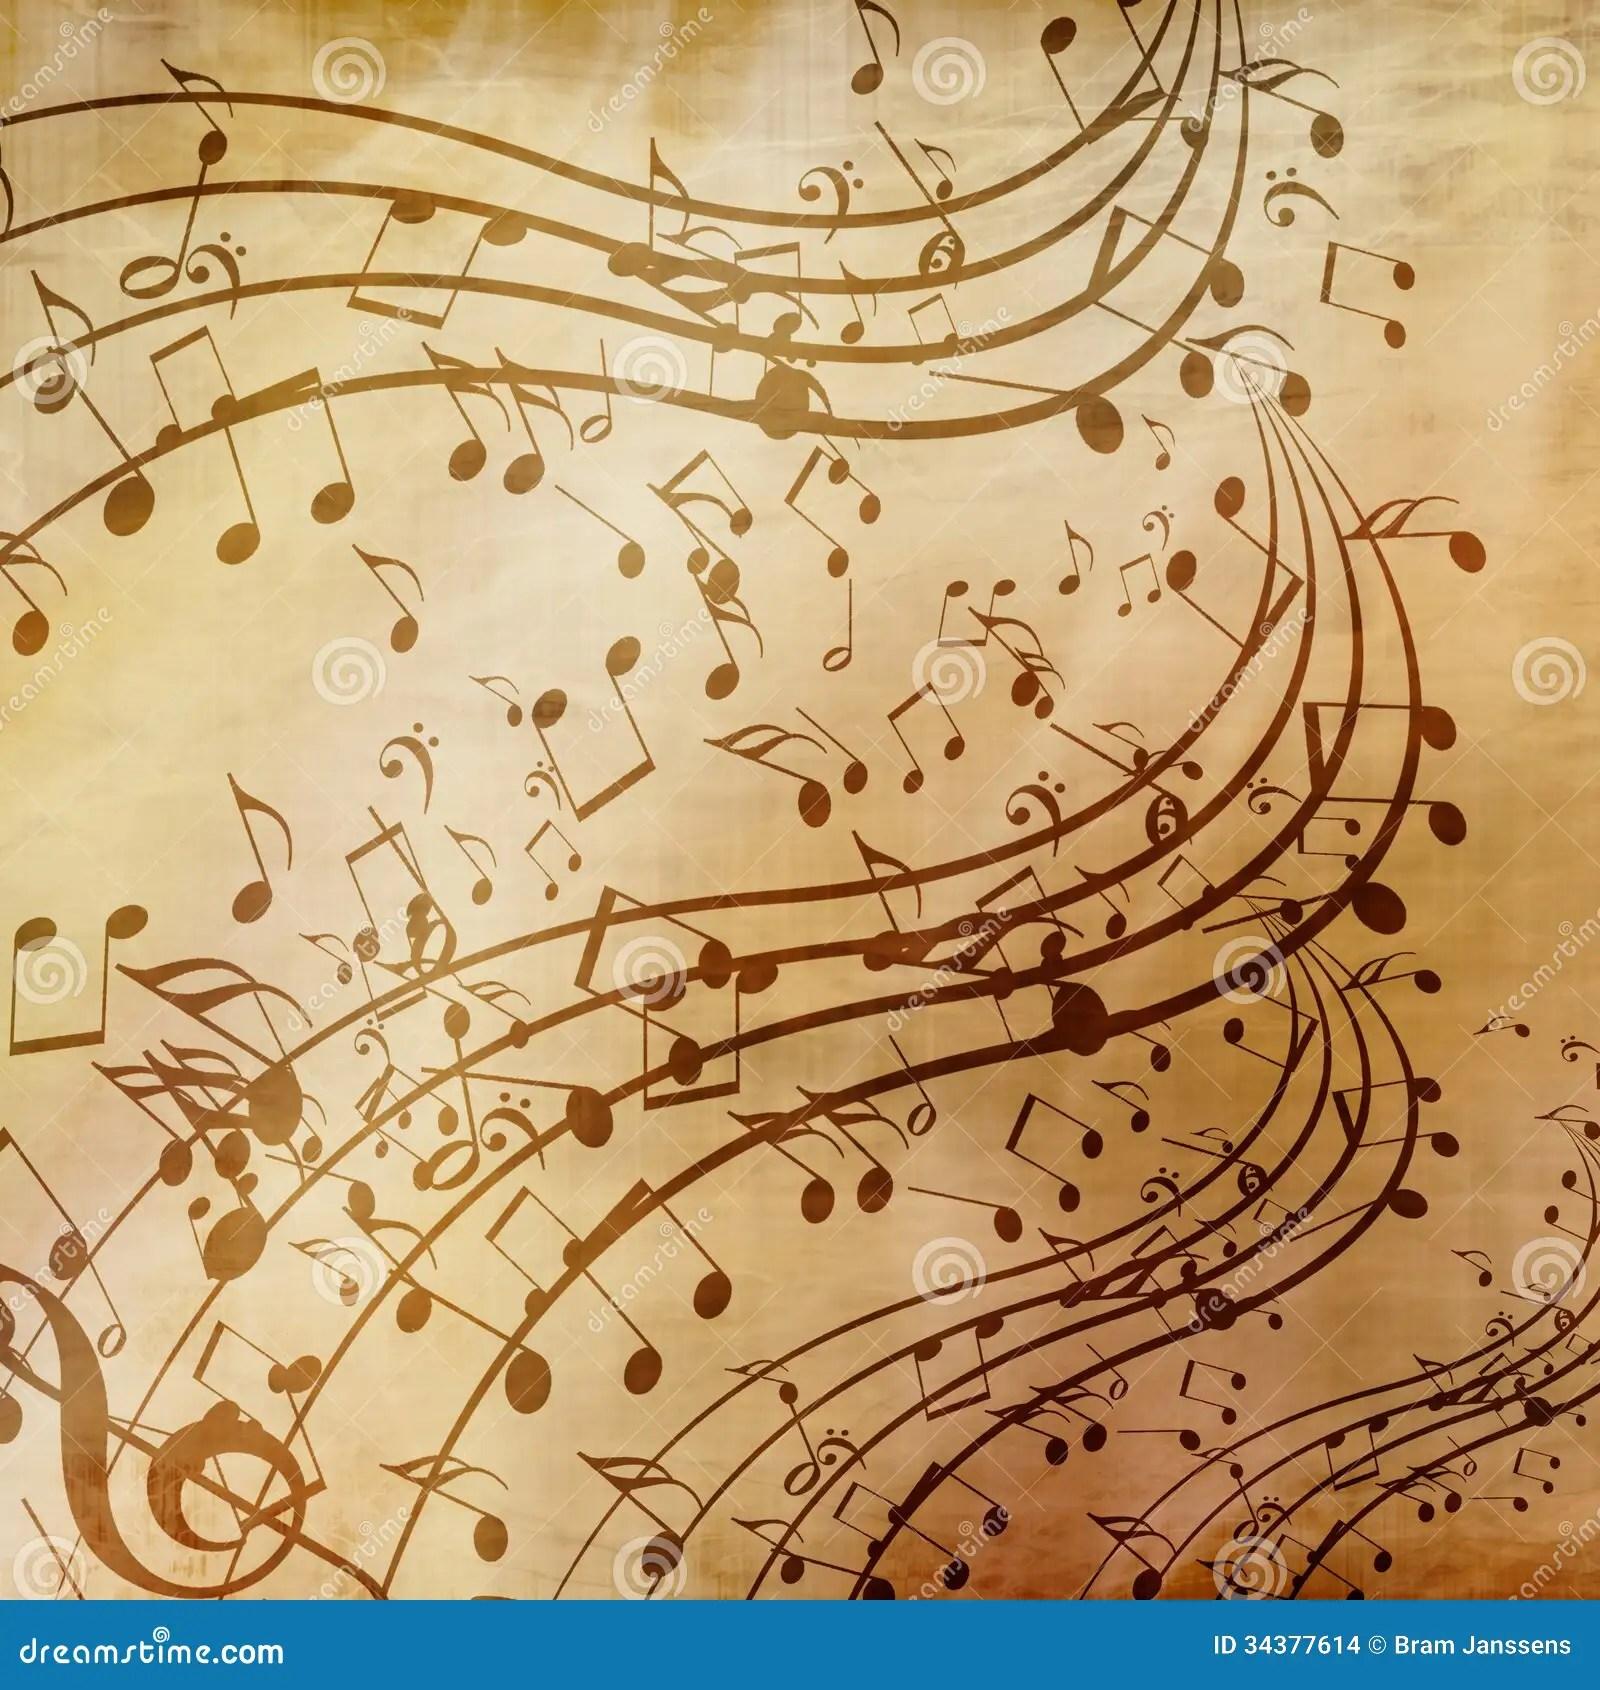 Music Sheet Stock Images - Image: 34377614